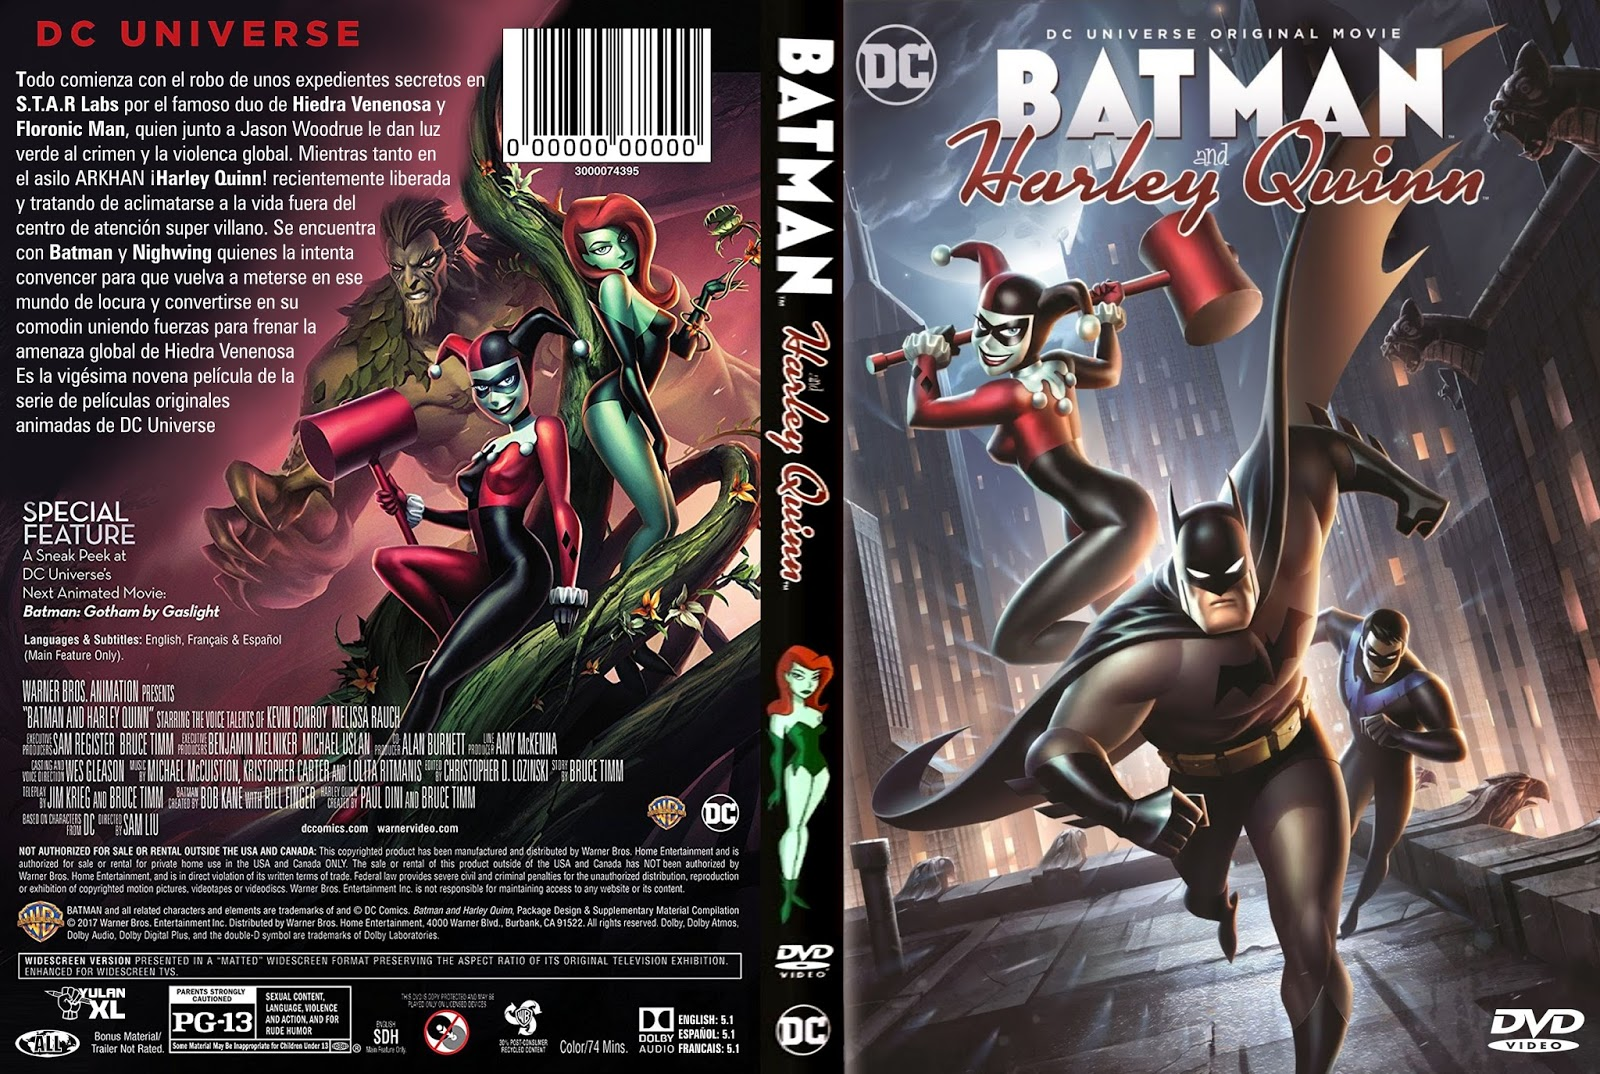 Batmay y Harley Quinn | Peliculas en dvd